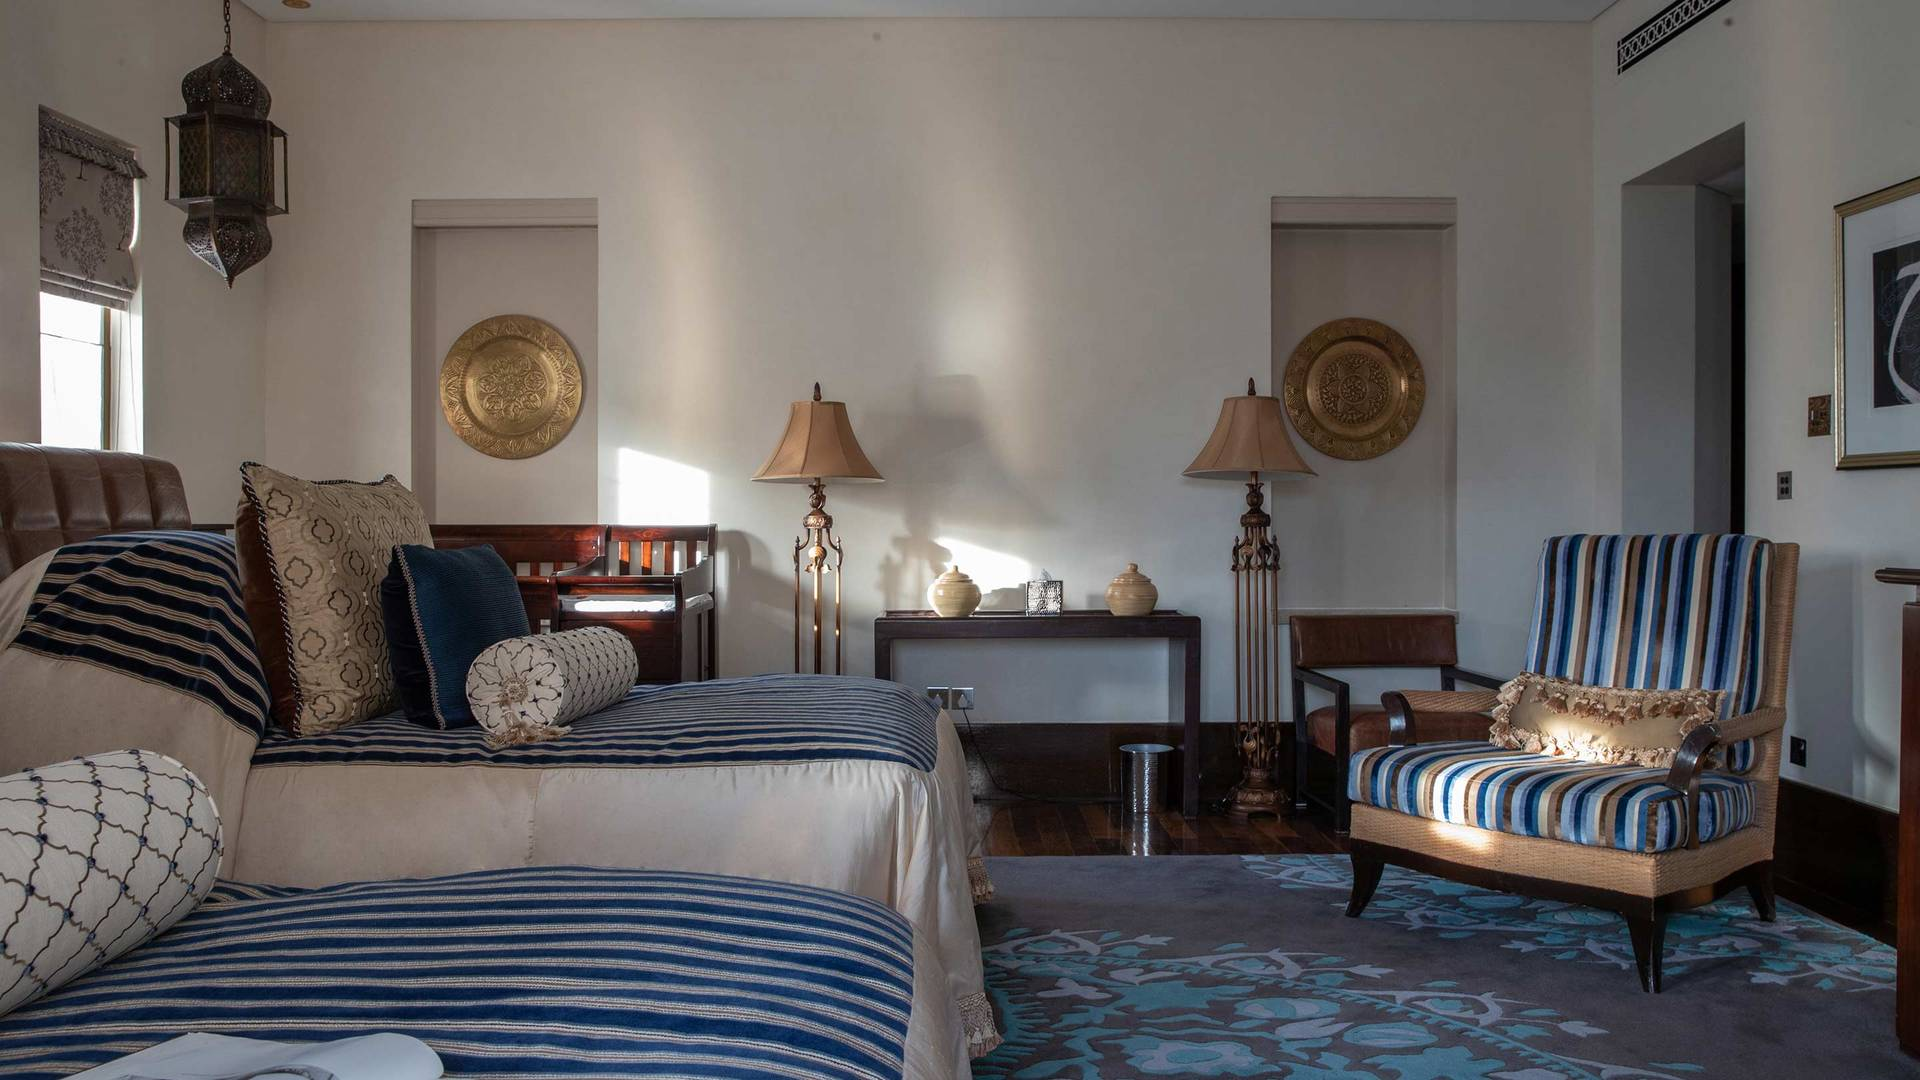 Jumeirah Dar Al Masyaf Royal Malakiya Villa guest bedroom_16-9